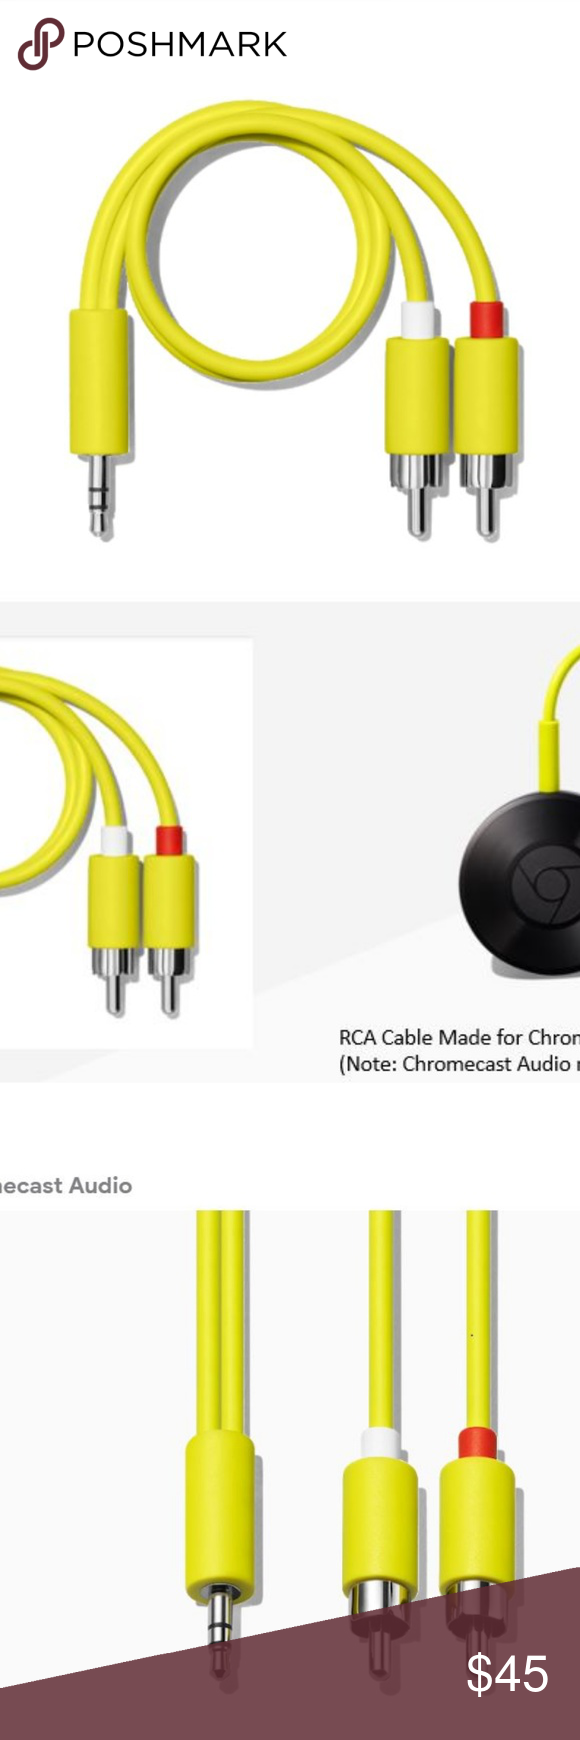 google optical cable chromecast audio google chromecast audio optical cable this item is brand new  [ 580 x 1740 Pixel ]